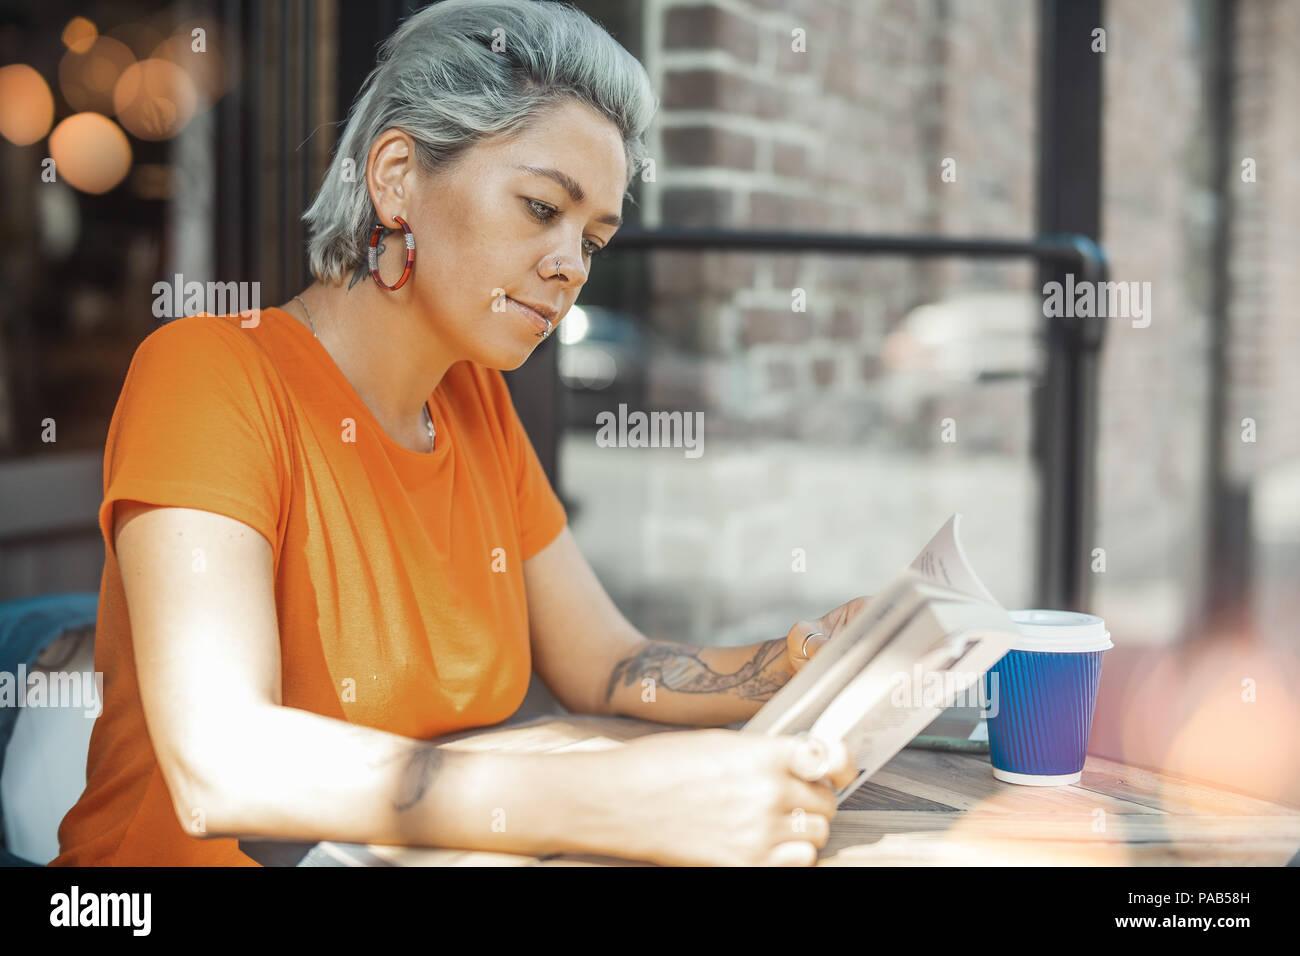 Atractiva chica rubia tatuada libro de lectura Imagen De Stock